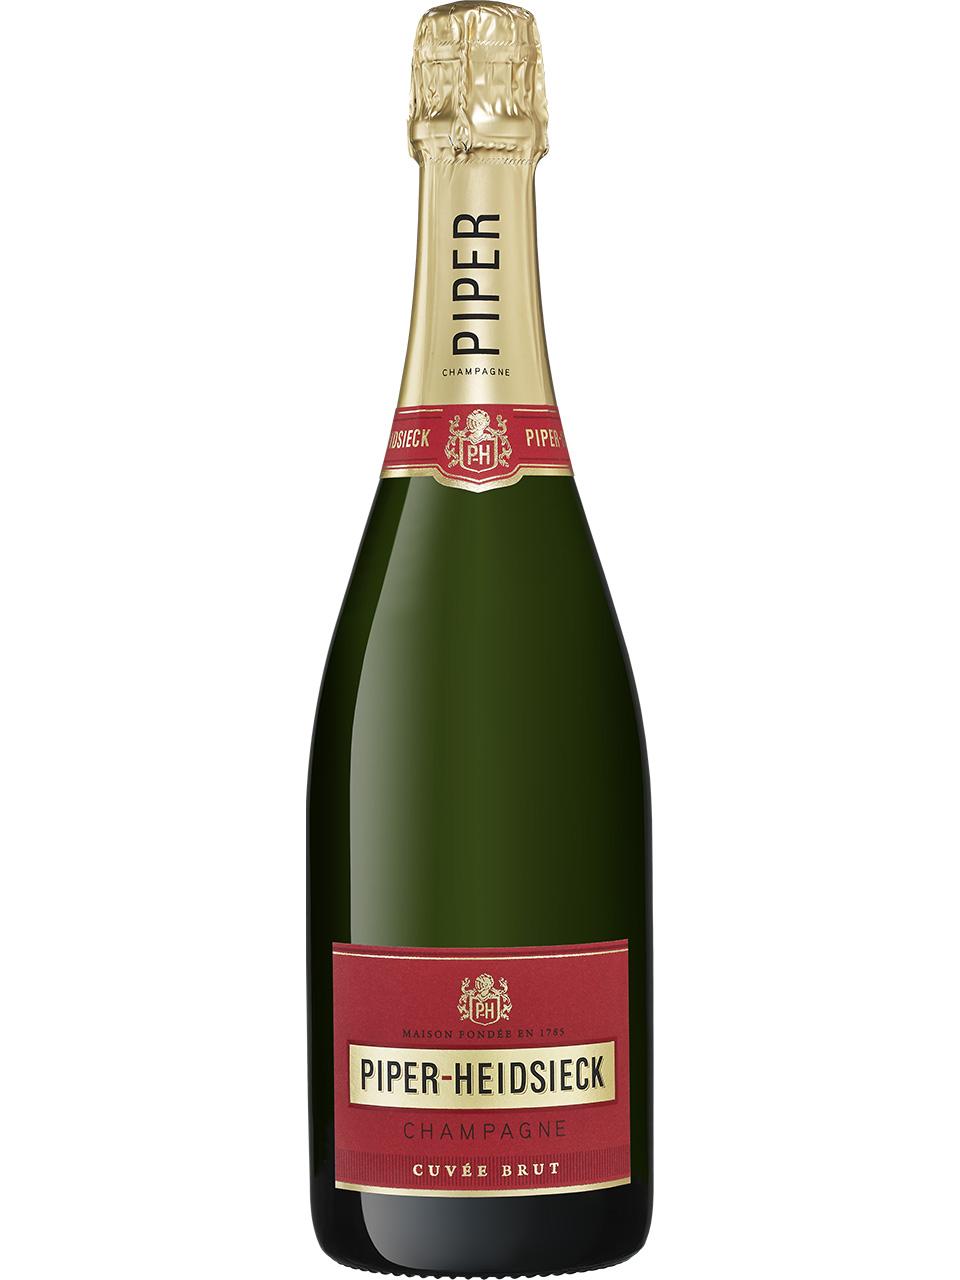 Piper Heidsieck Brut Champagne